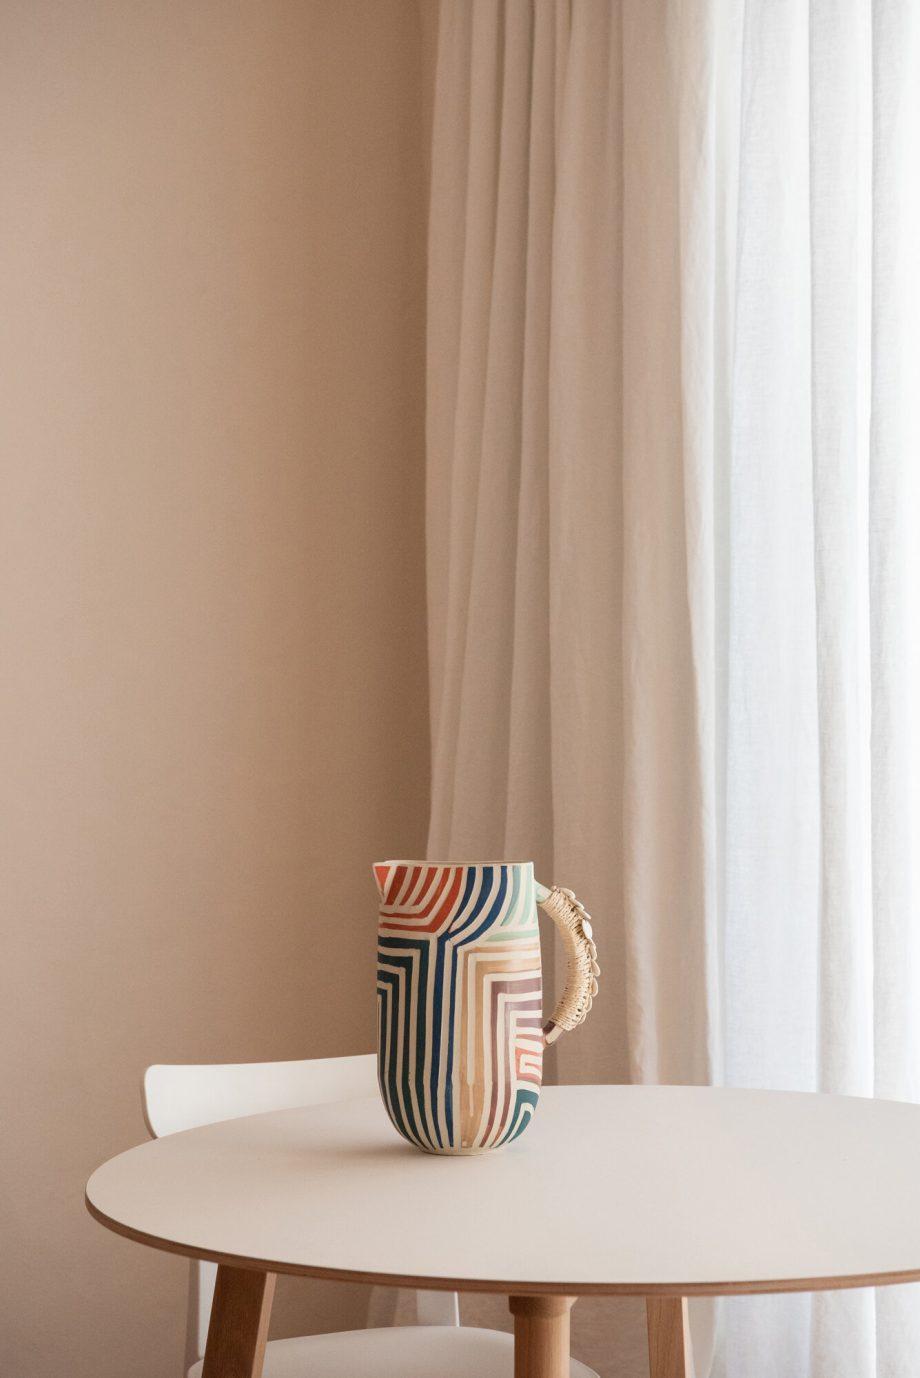 Jarro Tribal Anna Westerlund Ceramics